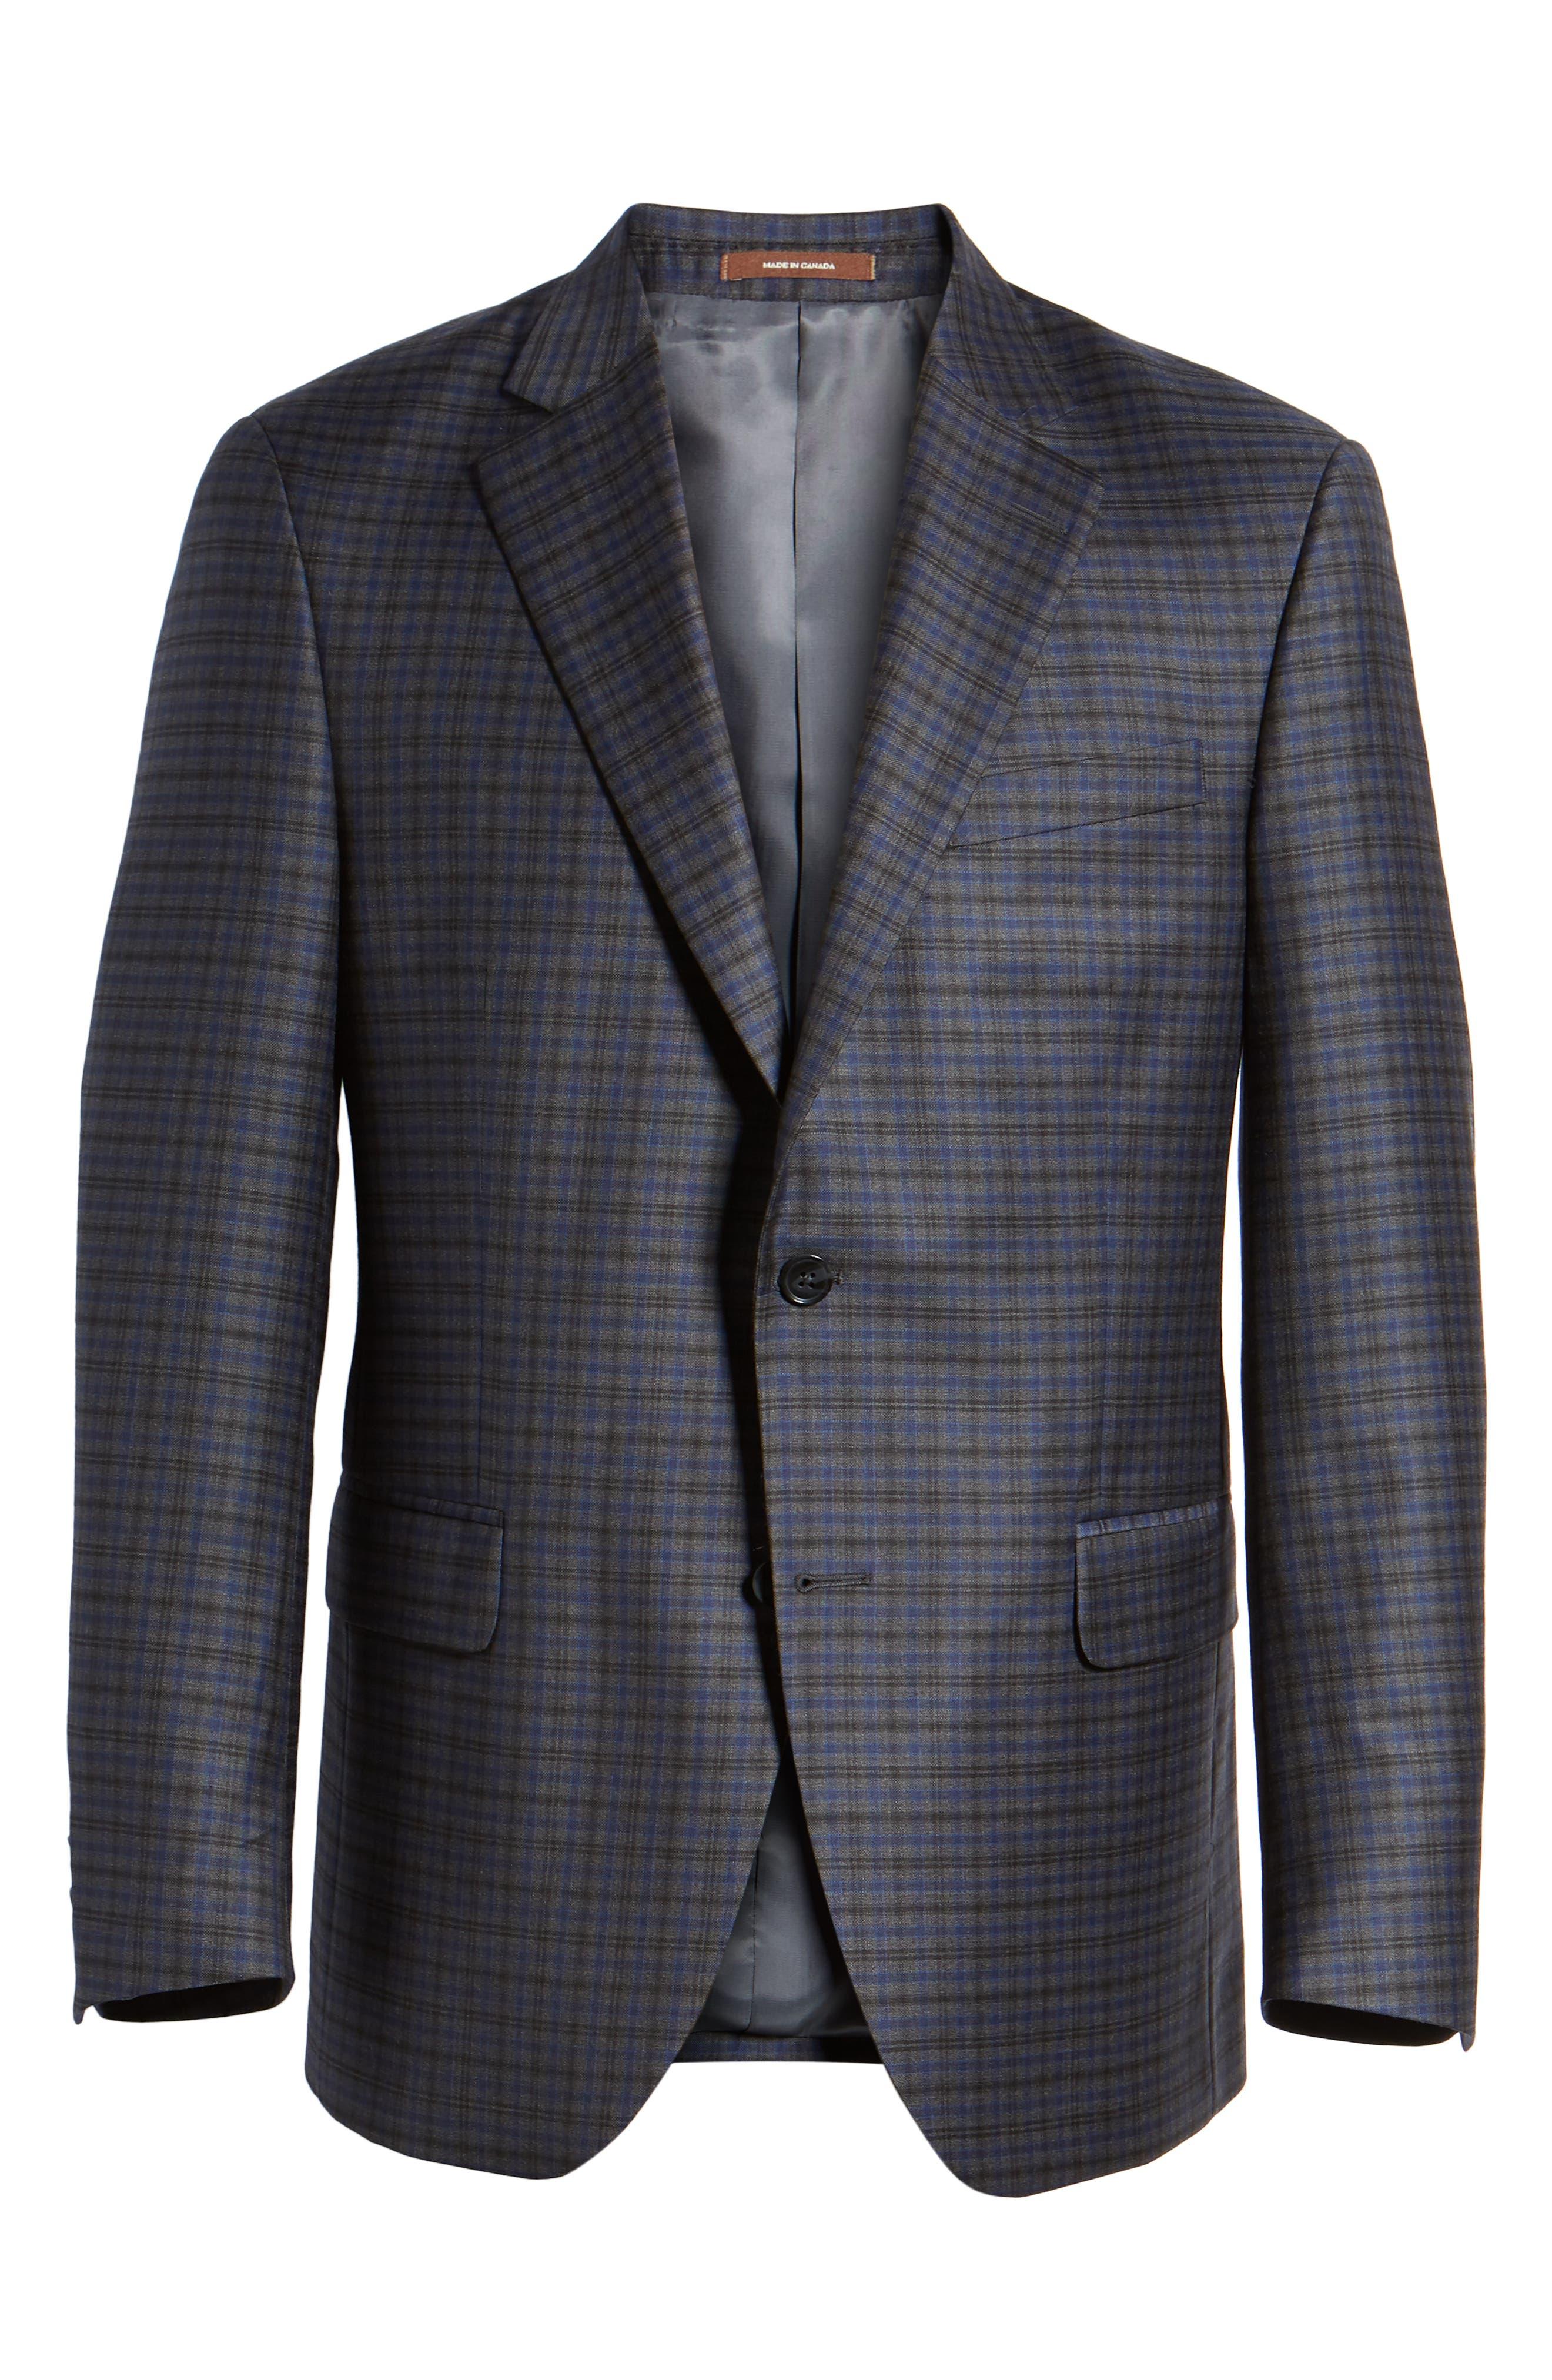 PETER MILLAR,                             Classic Fit Windowpane Check Wool Sport Coat,                             Alternate thumbnail 5, color,                             020